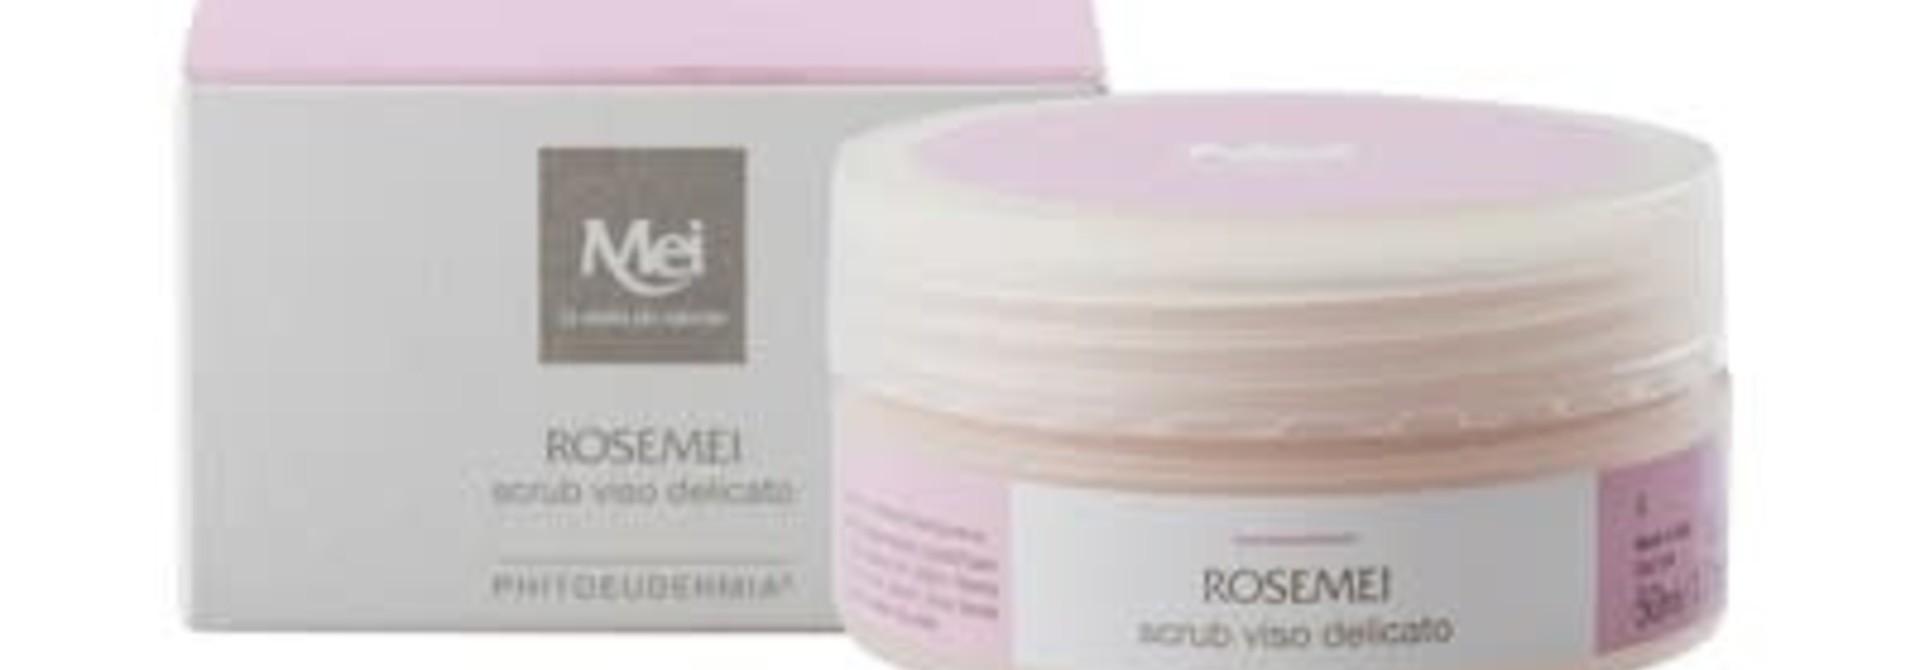 RoseMEI Face Scrub